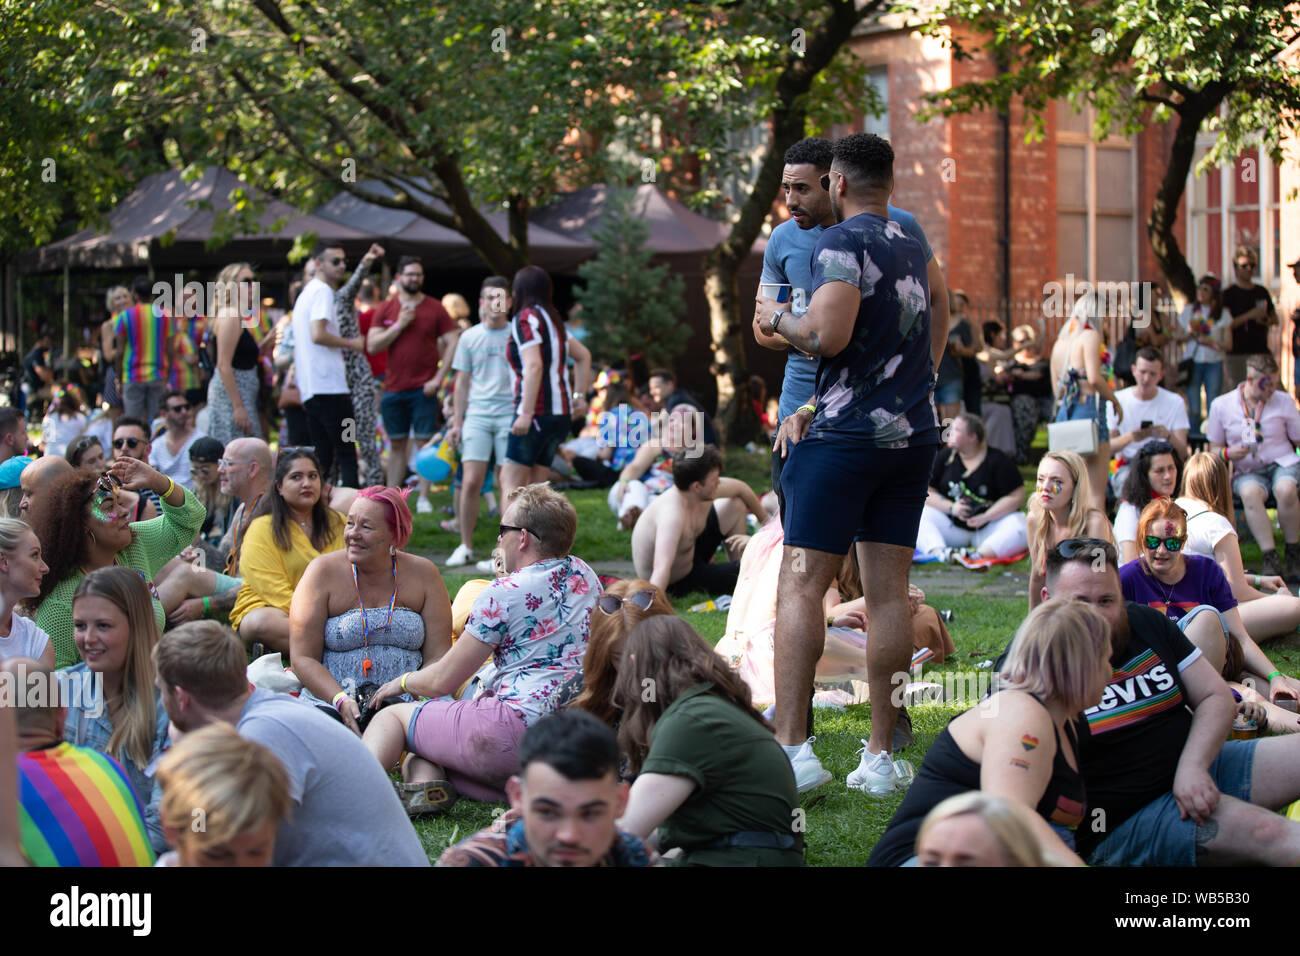 Manchester, Reino Unido, 24 de 4 de agosto de 2019. Las personas asistir a Manchester orgullo. Orgullo de Manchester está organizada para celebrar una gran variedad de sexualidades. Crédito: Jonathan Nicholson/Alamy Live News. Foto de stock